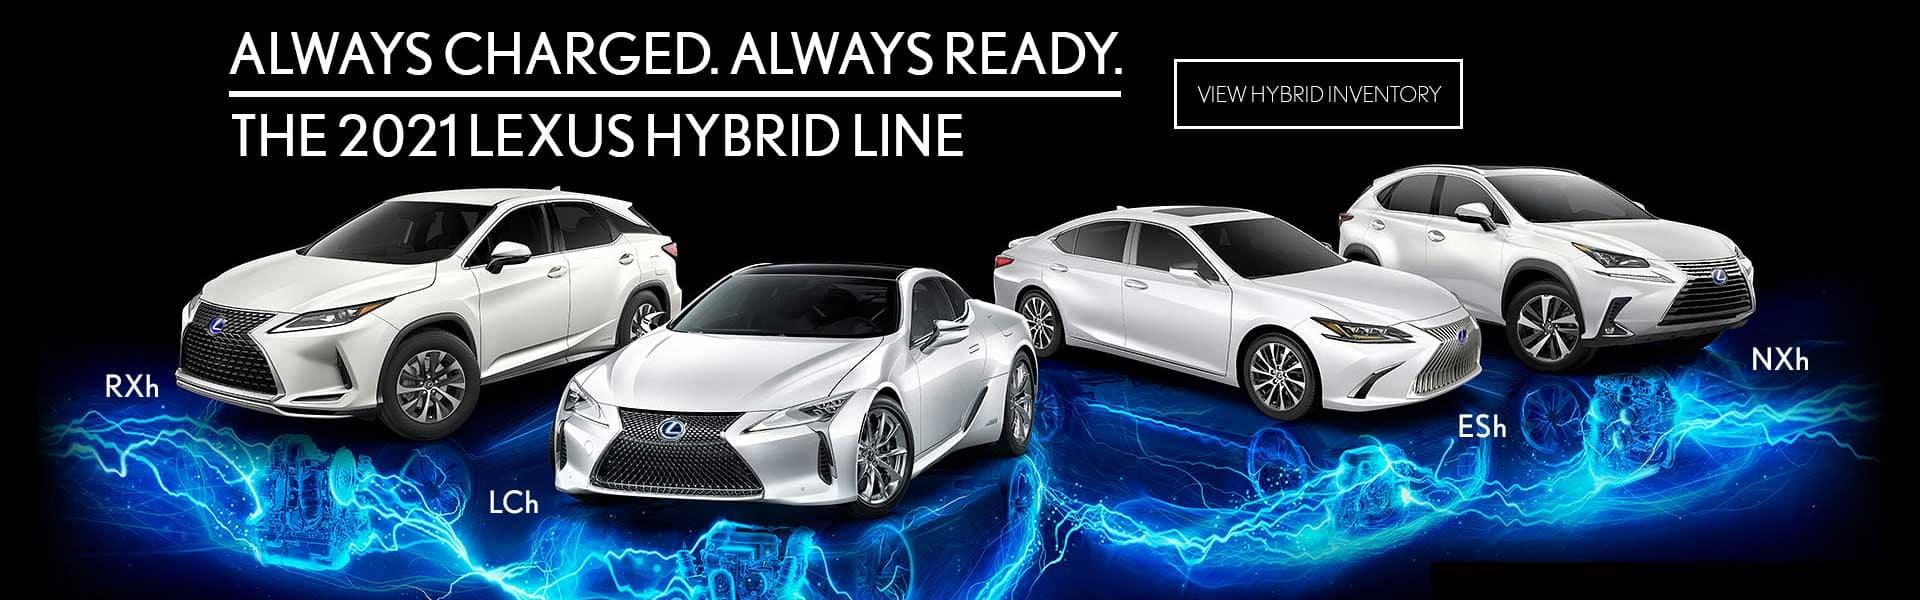 Lexus Hybrid Model Range RXh LCh, ESh NXh